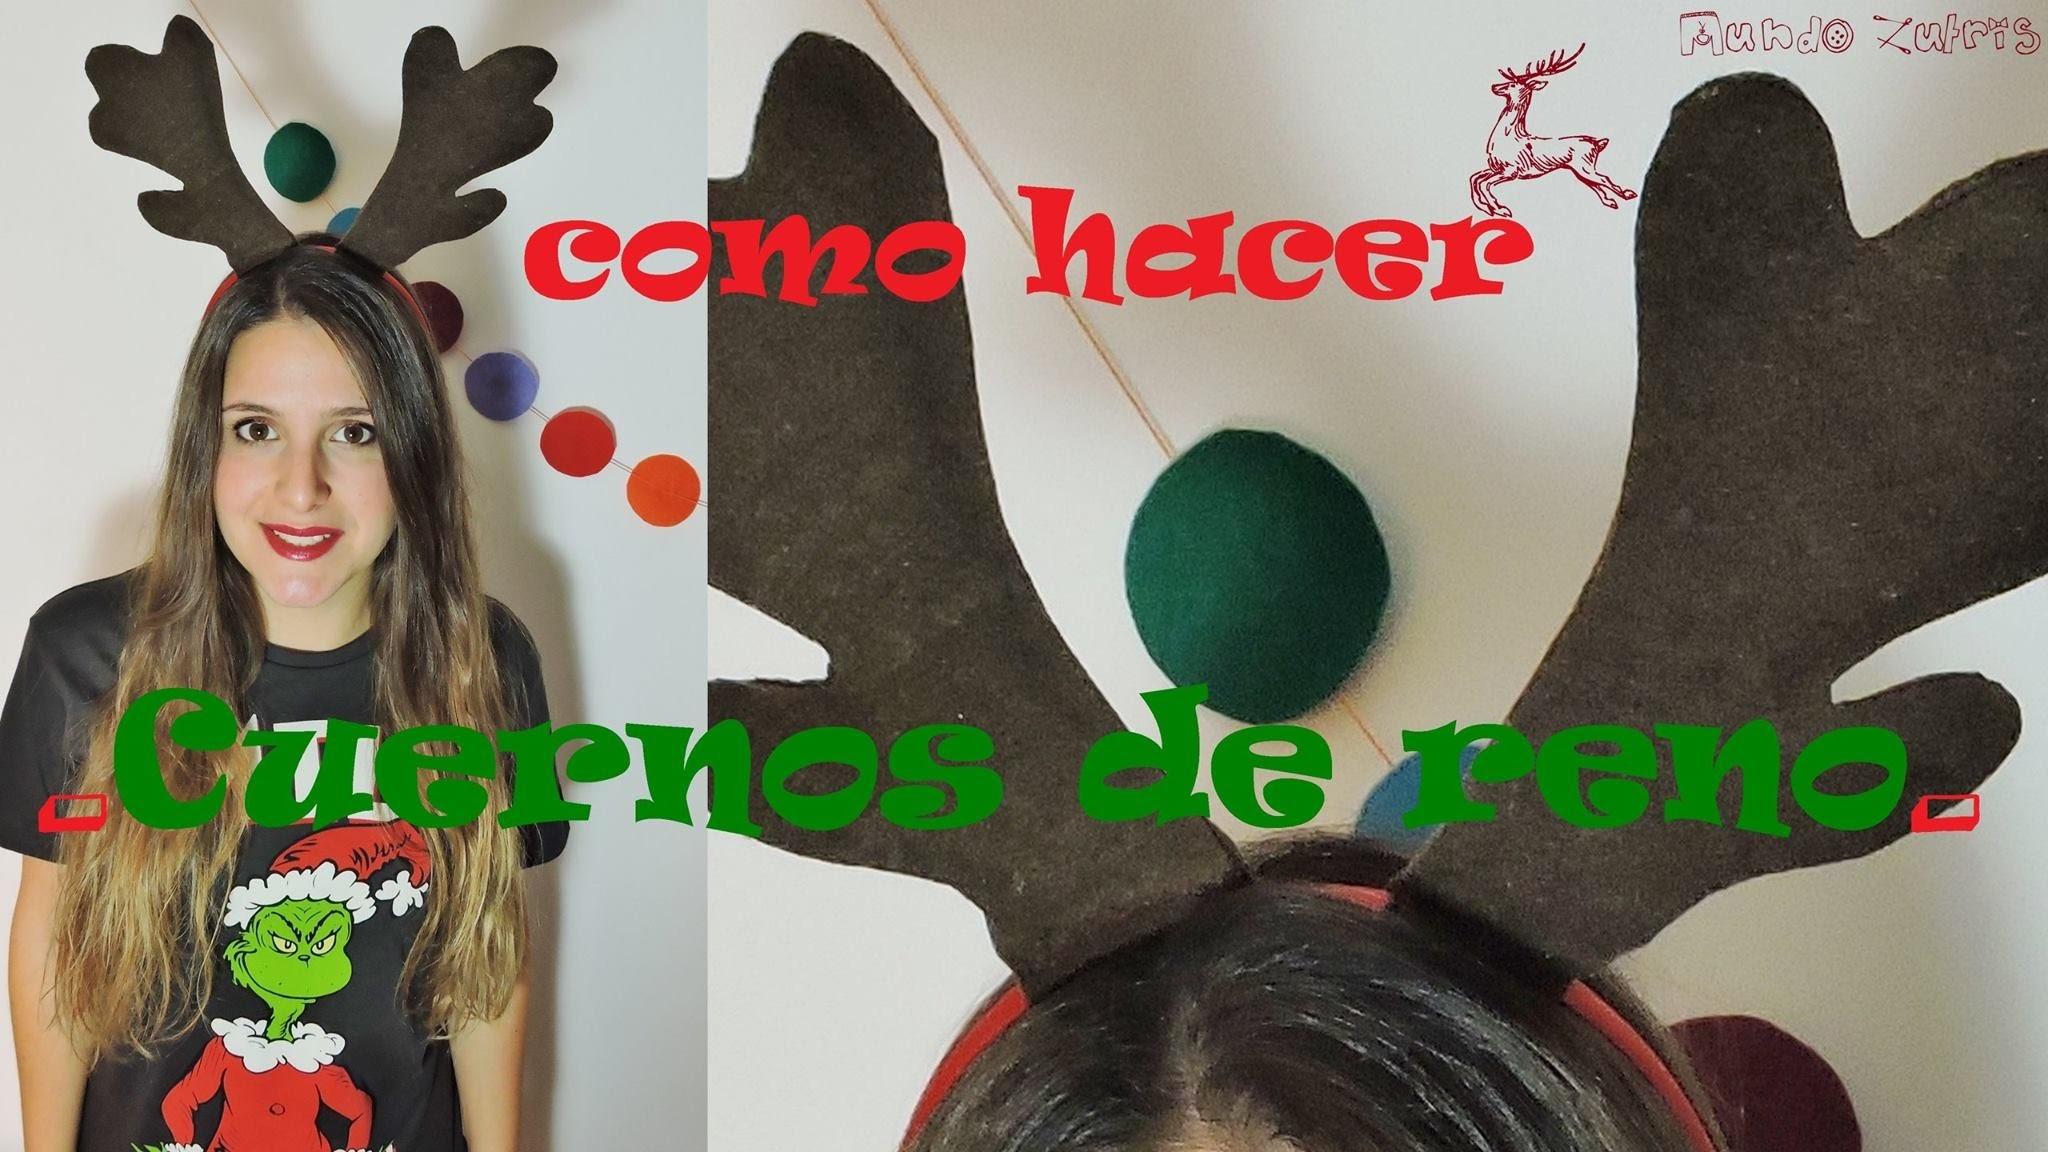 CHRISTMAS DIY - Como hacer cuernos de reno - How to make reindeer horn